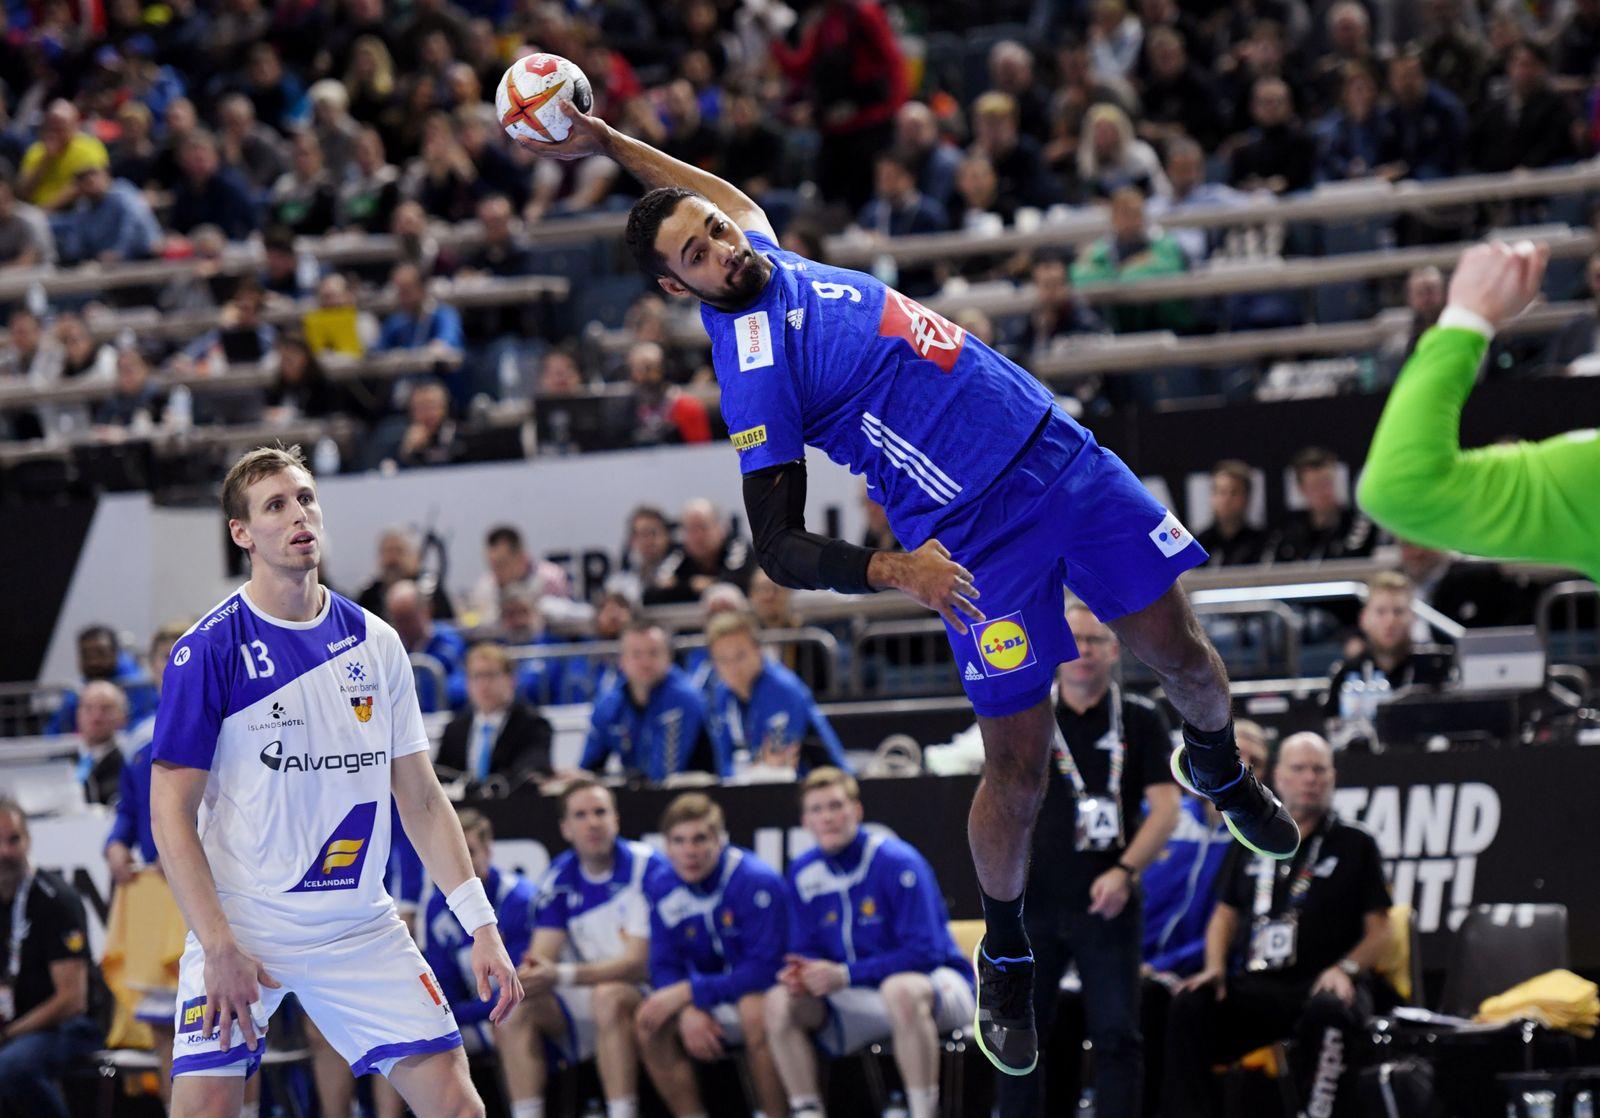 IHF Handball World Championship - Germany & Denmark 2019 - Main Round - Group 1 - Iceland v France